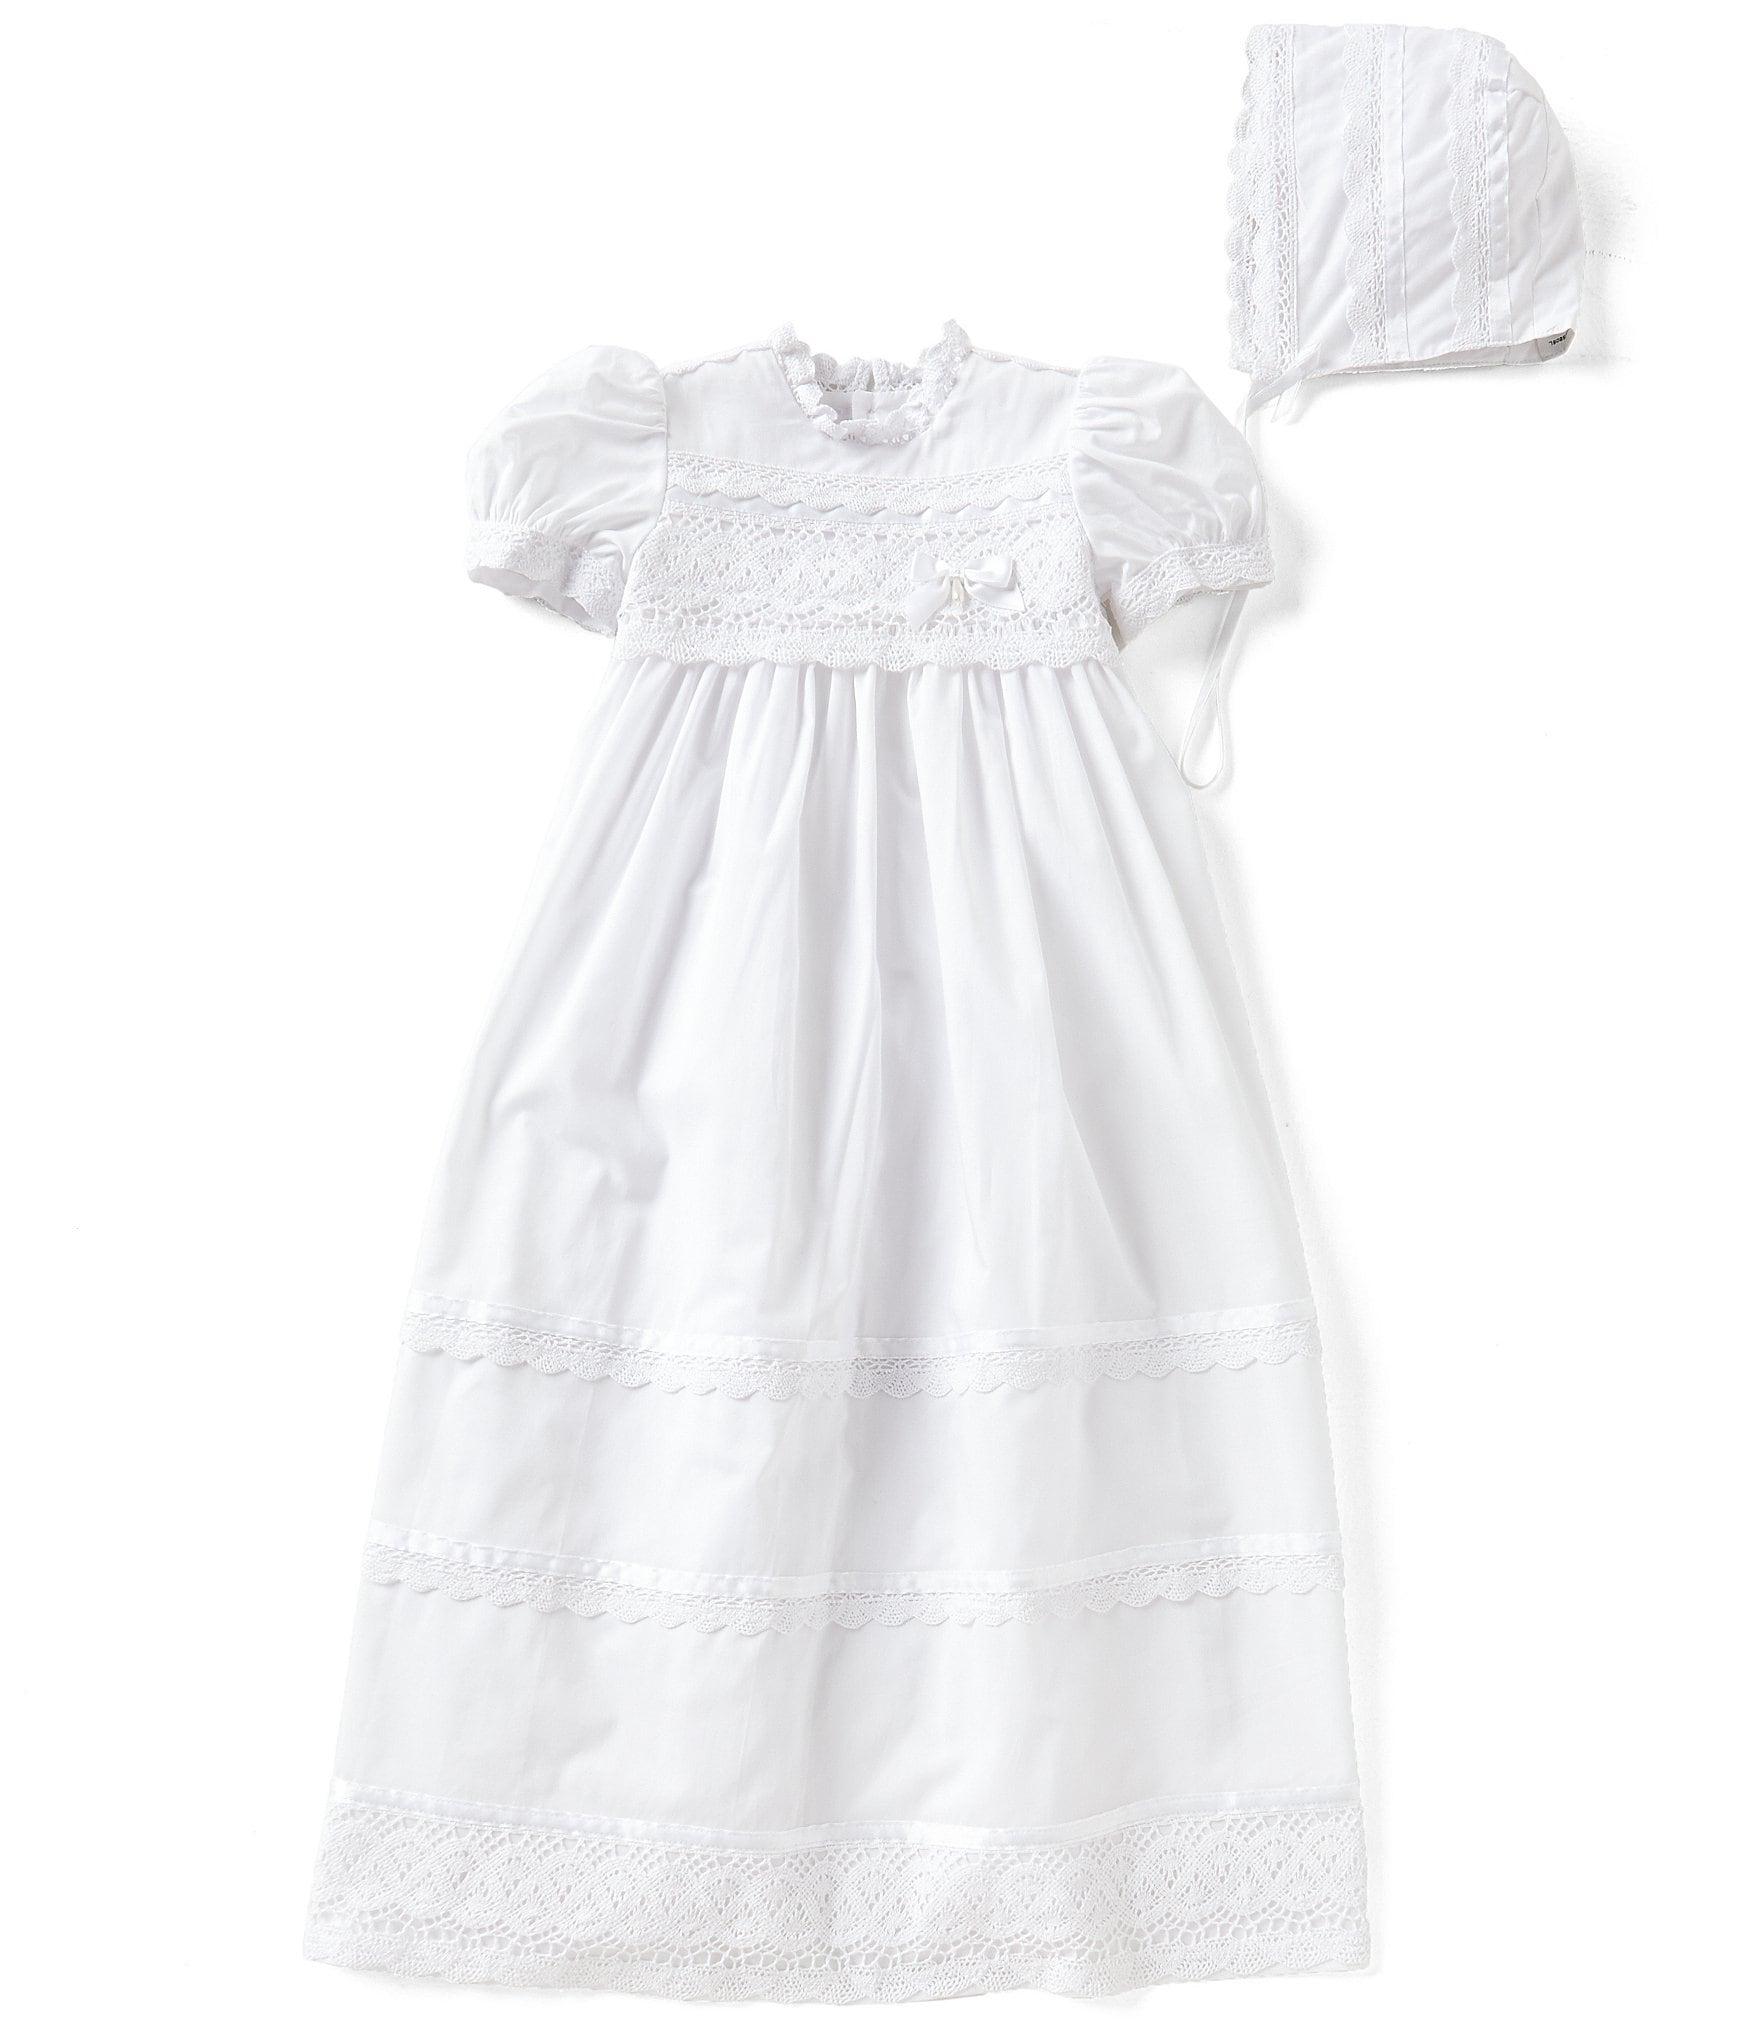 White dress drawing - White Dress Drawing 31